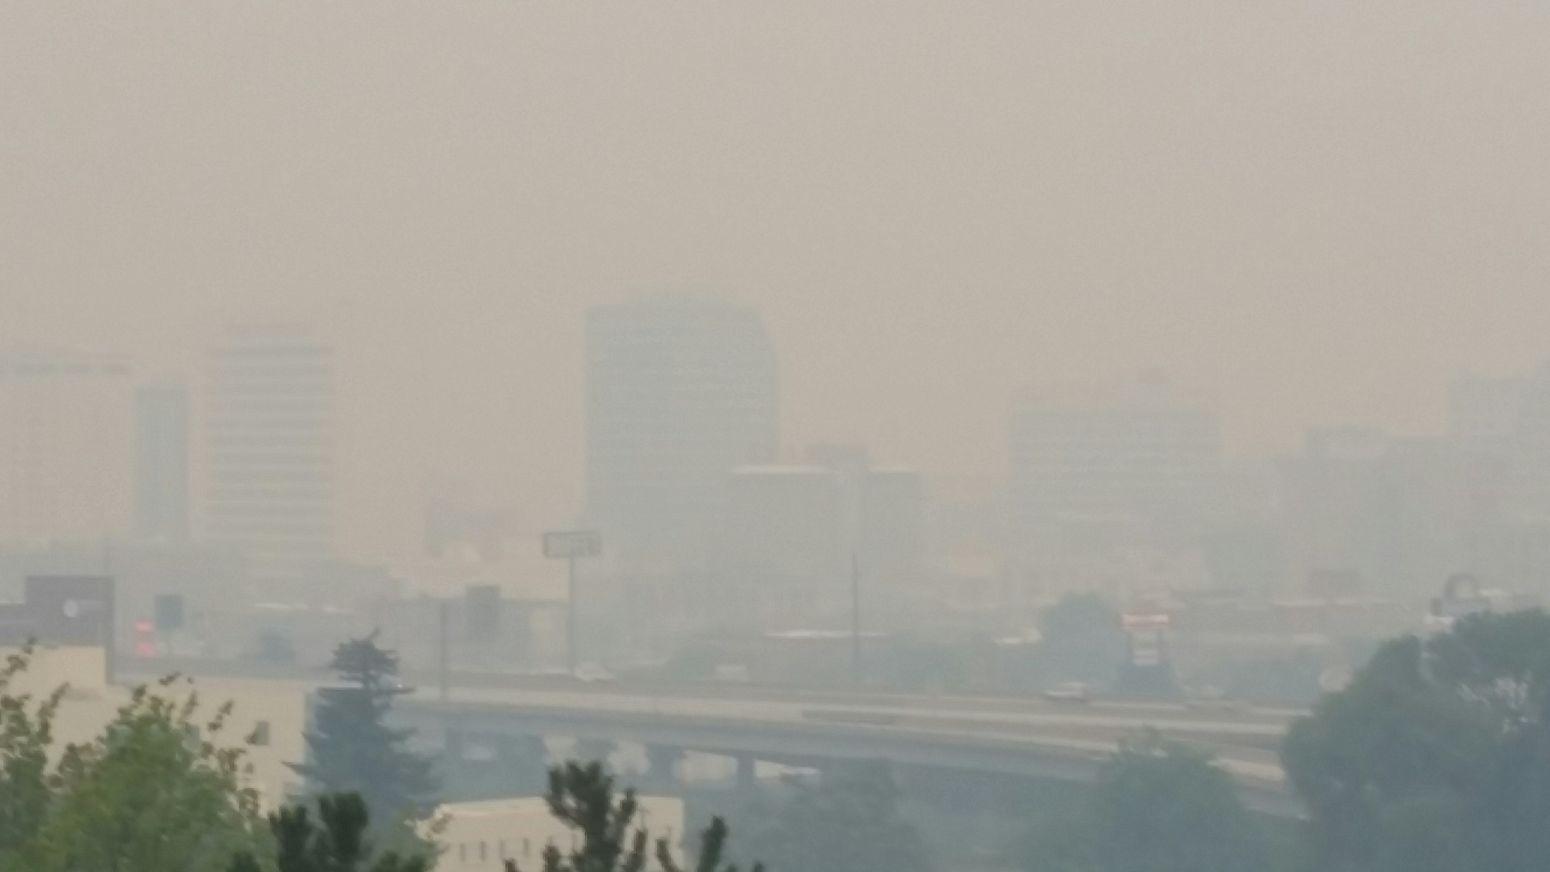 Smokey Day Spokane Wa aug 21 2015